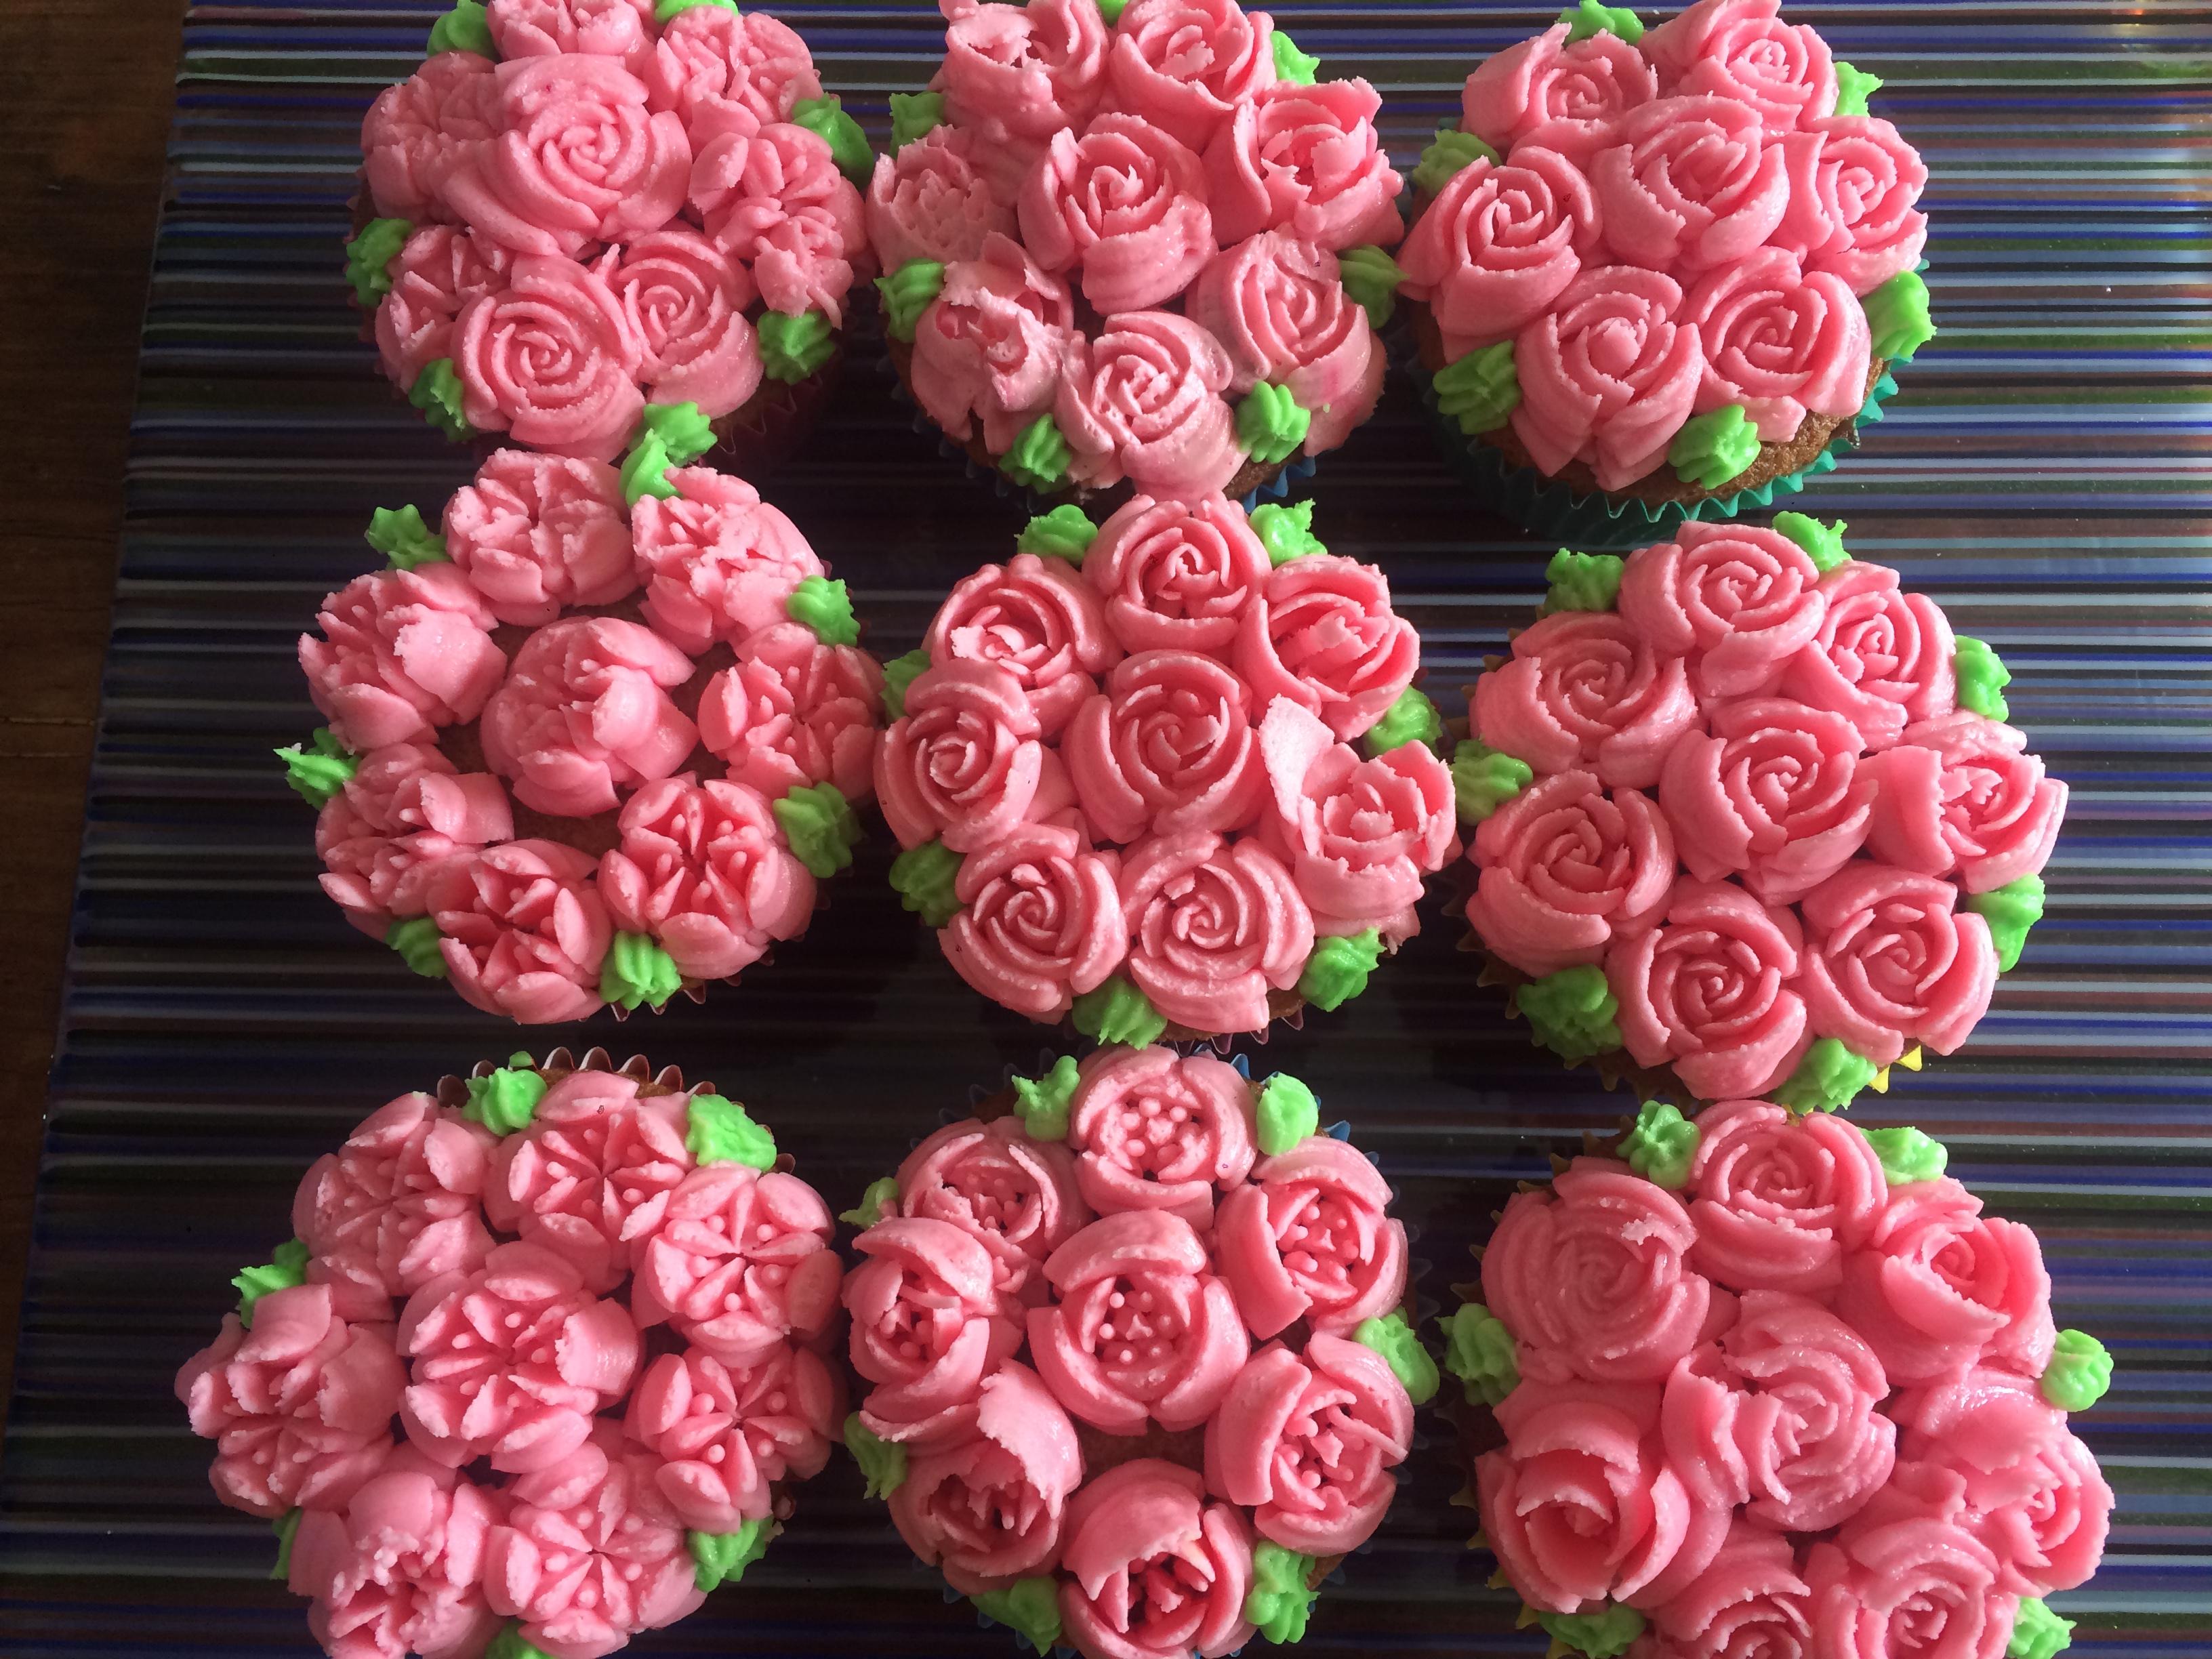 Cupcakes - Copy - Copy.JPG